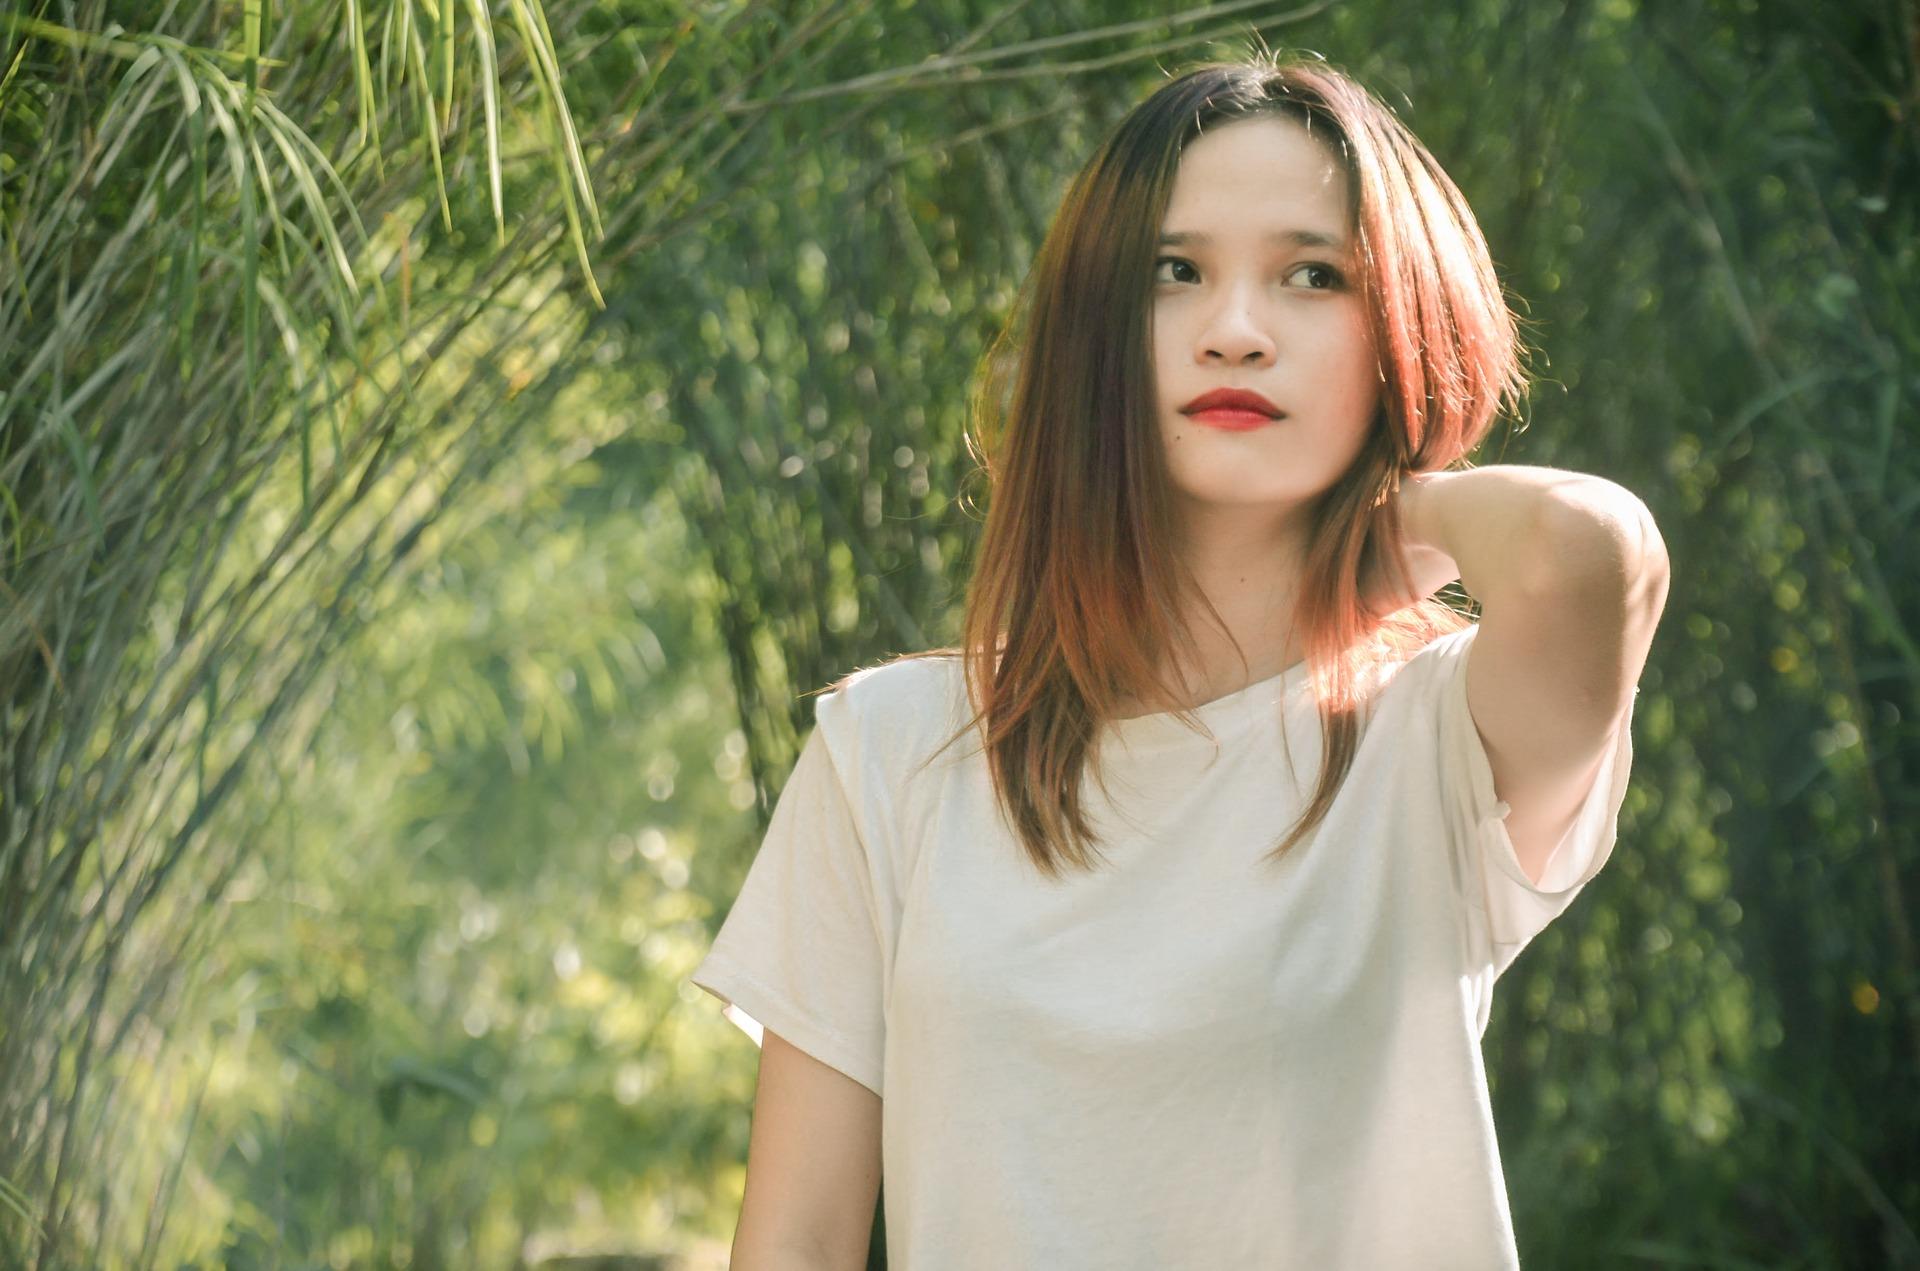 Best Ways to Find Single Women Online | Loveawake.com blog